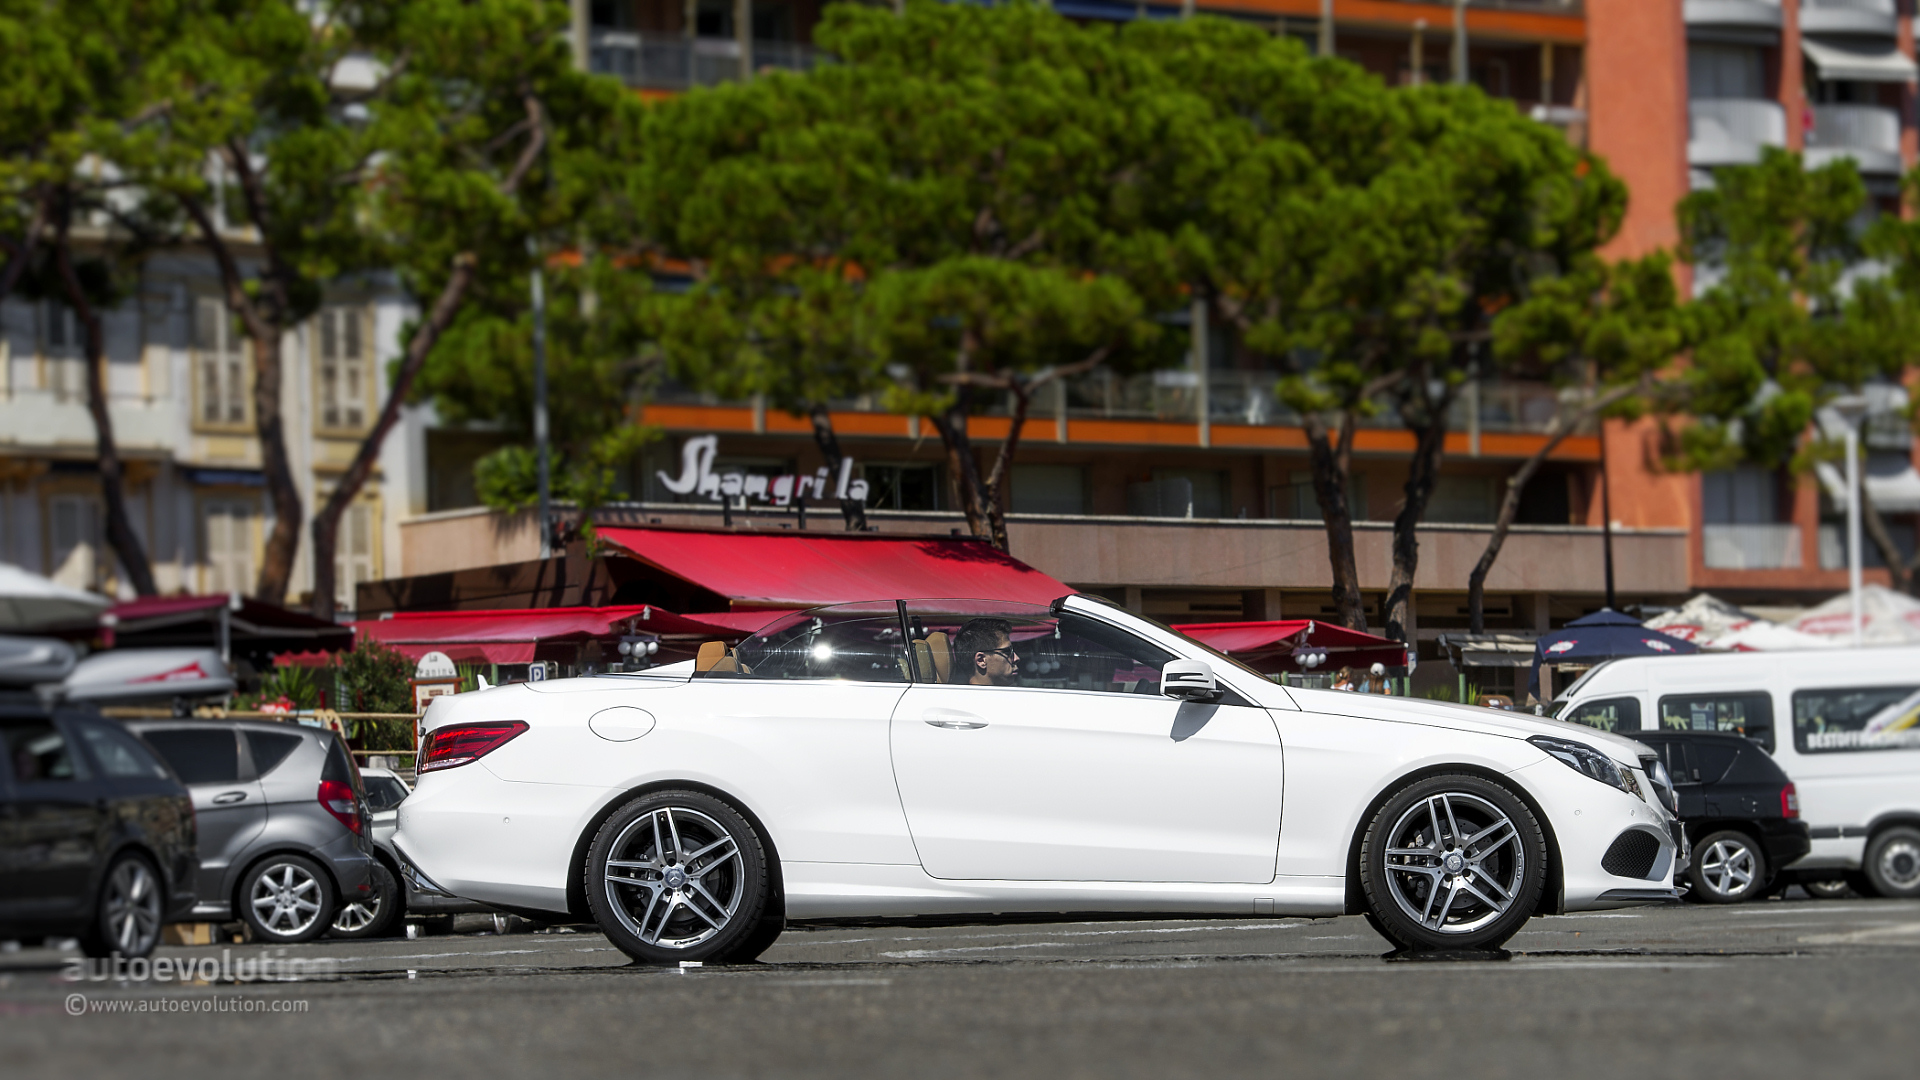 2014 mercedes benz e class cabriolet review autoevolution. Black Bedroom Furniture Sets. Home Design Ideas